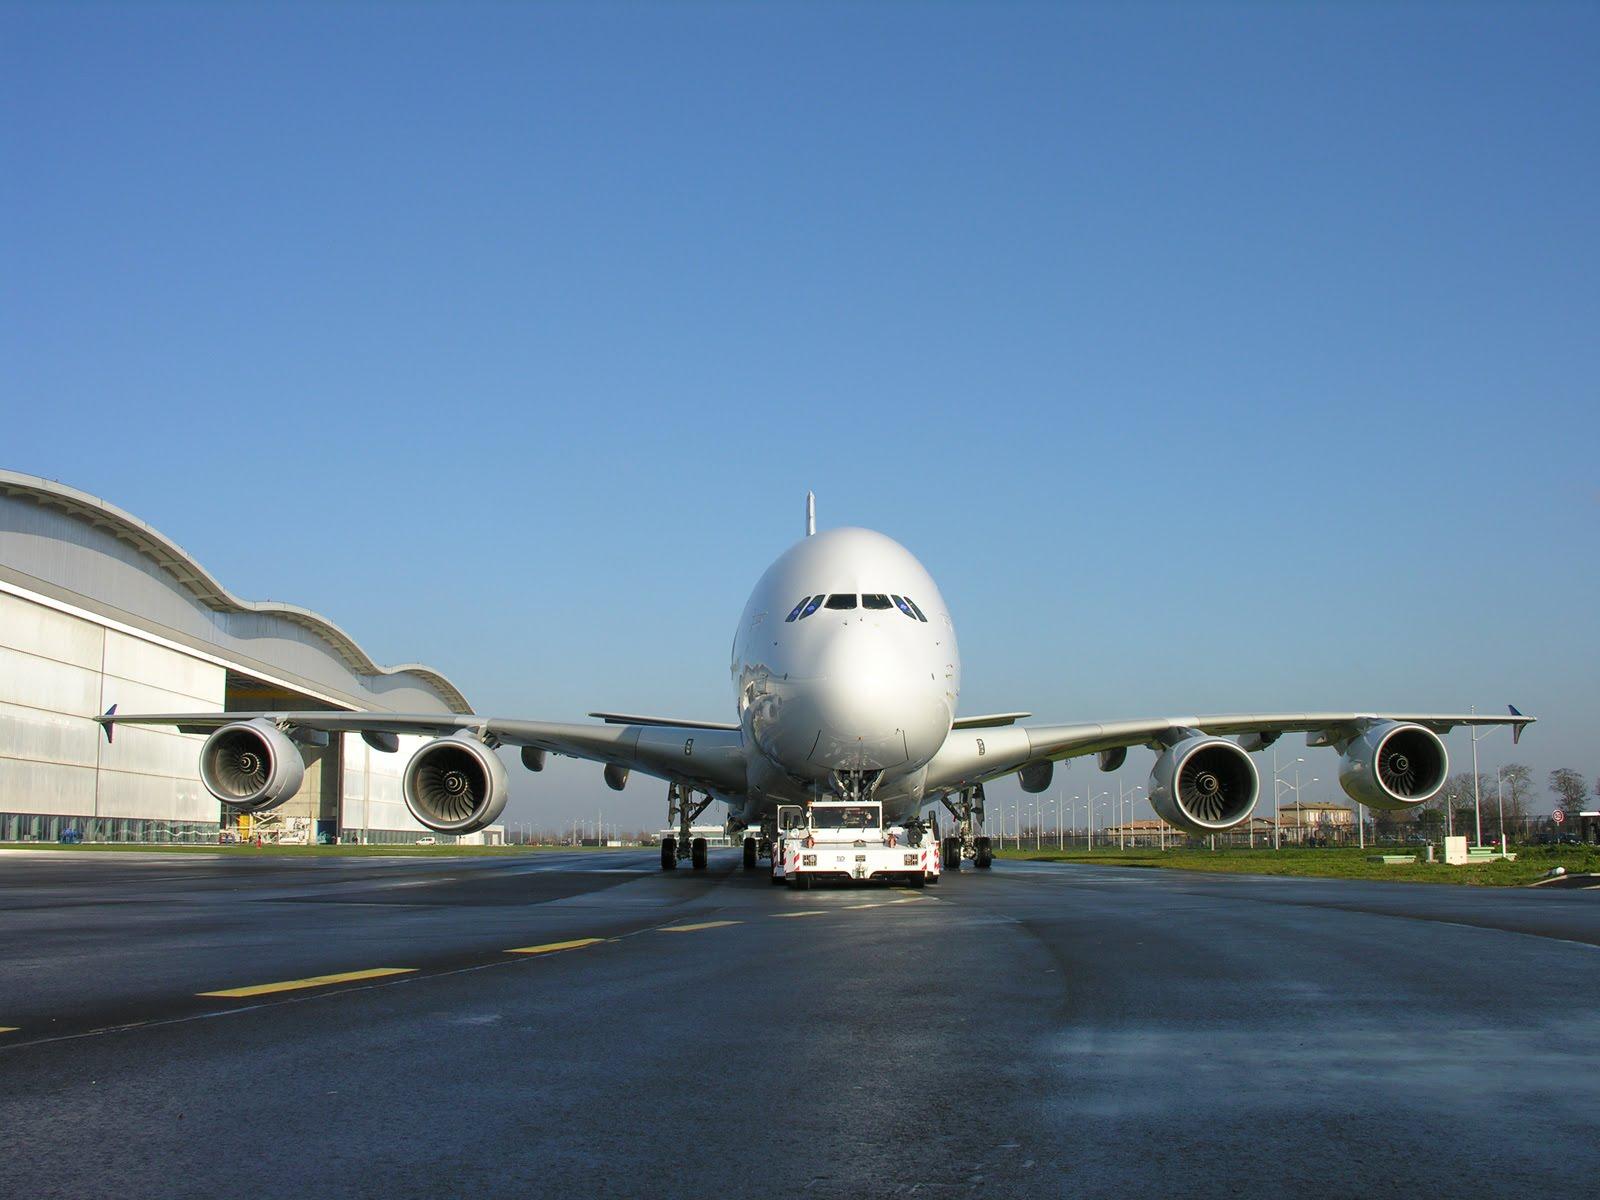 http://1.bp.blogspot.com/_2U3U6AwE-ZQ/S-BsmUcRtII/AAAAAAAAAMM/5GQbOYLE4TA/s1600/Airbus_A380-003%28www.TheWallpapers.org%29.jpg